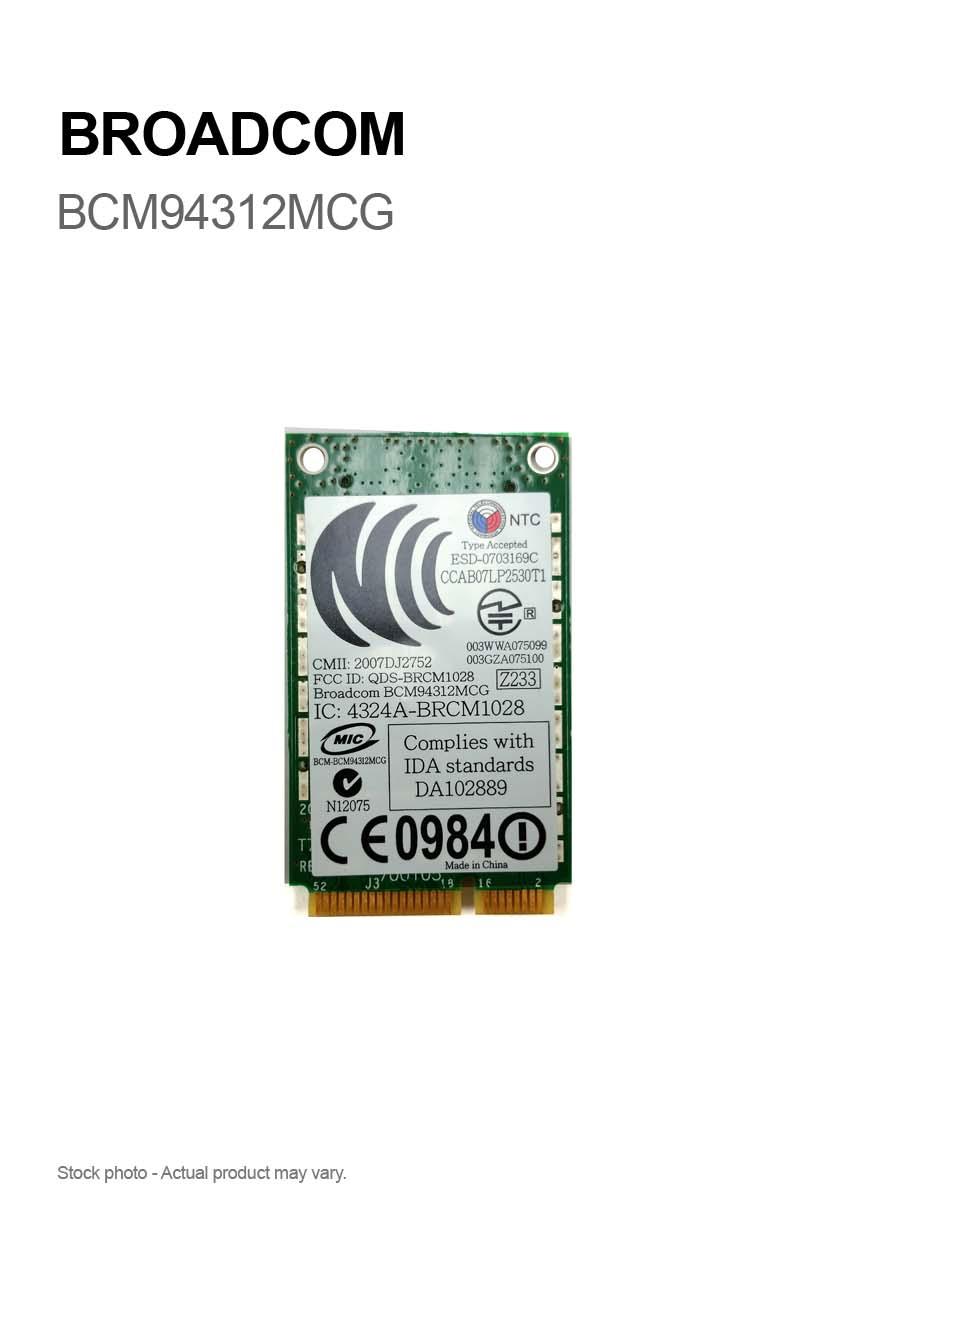 BROADCOM BCM4301 DRIVER FOR MAC DOWNLOAD